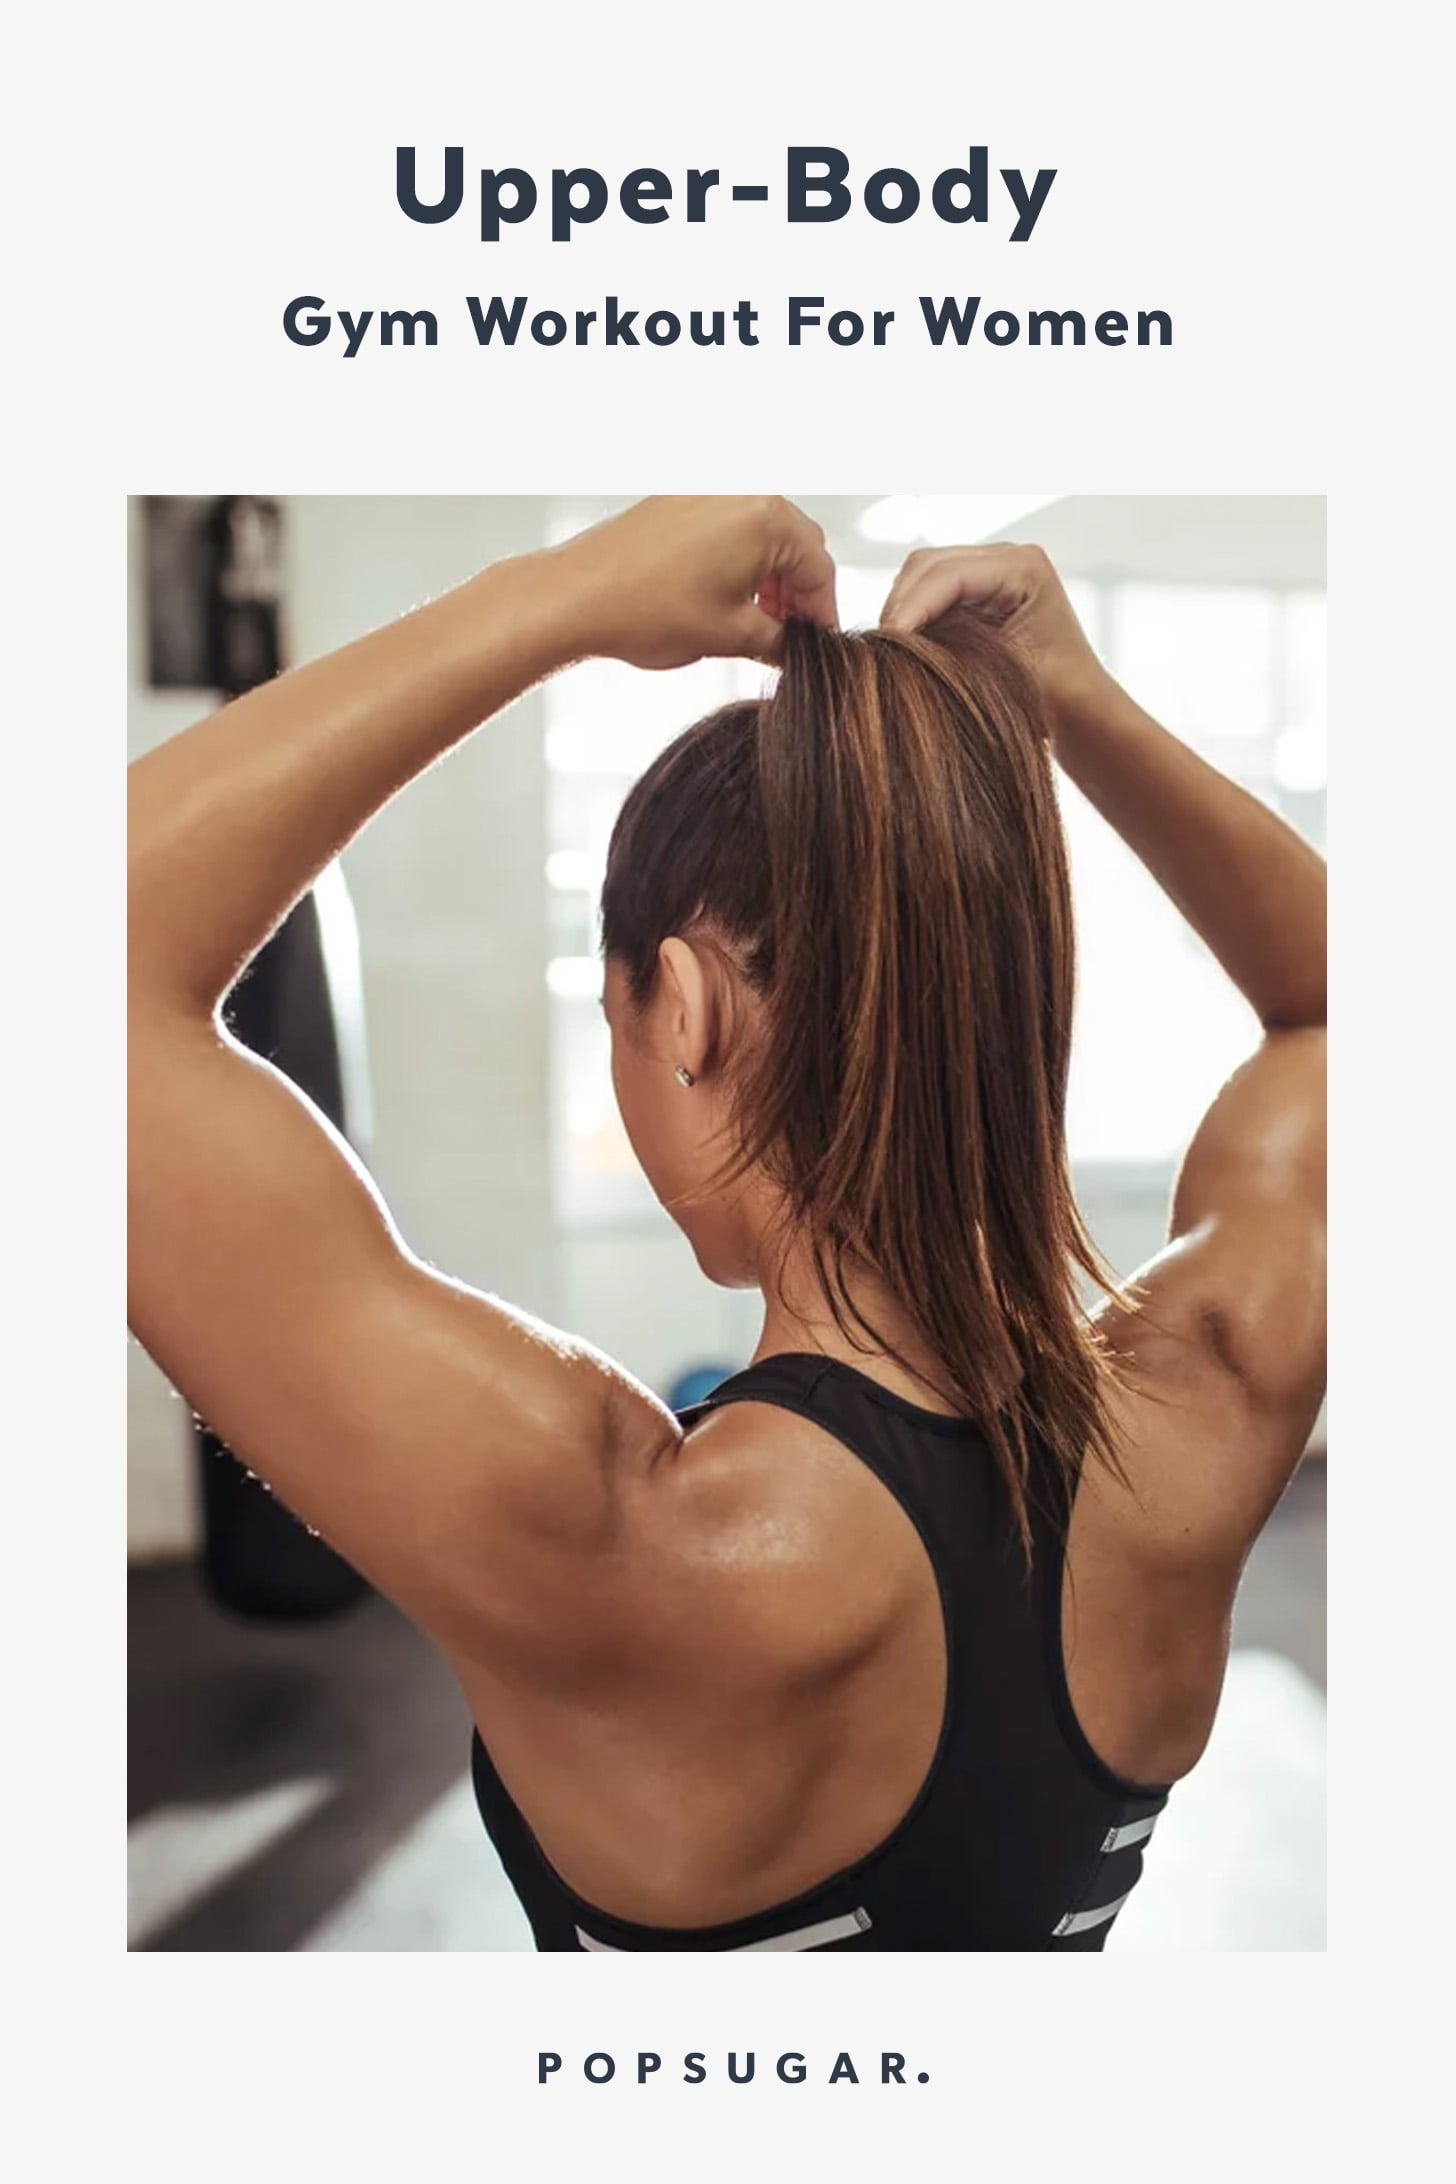 Upper Body Workout For Women At The Gym Popsugar Fitness Australia